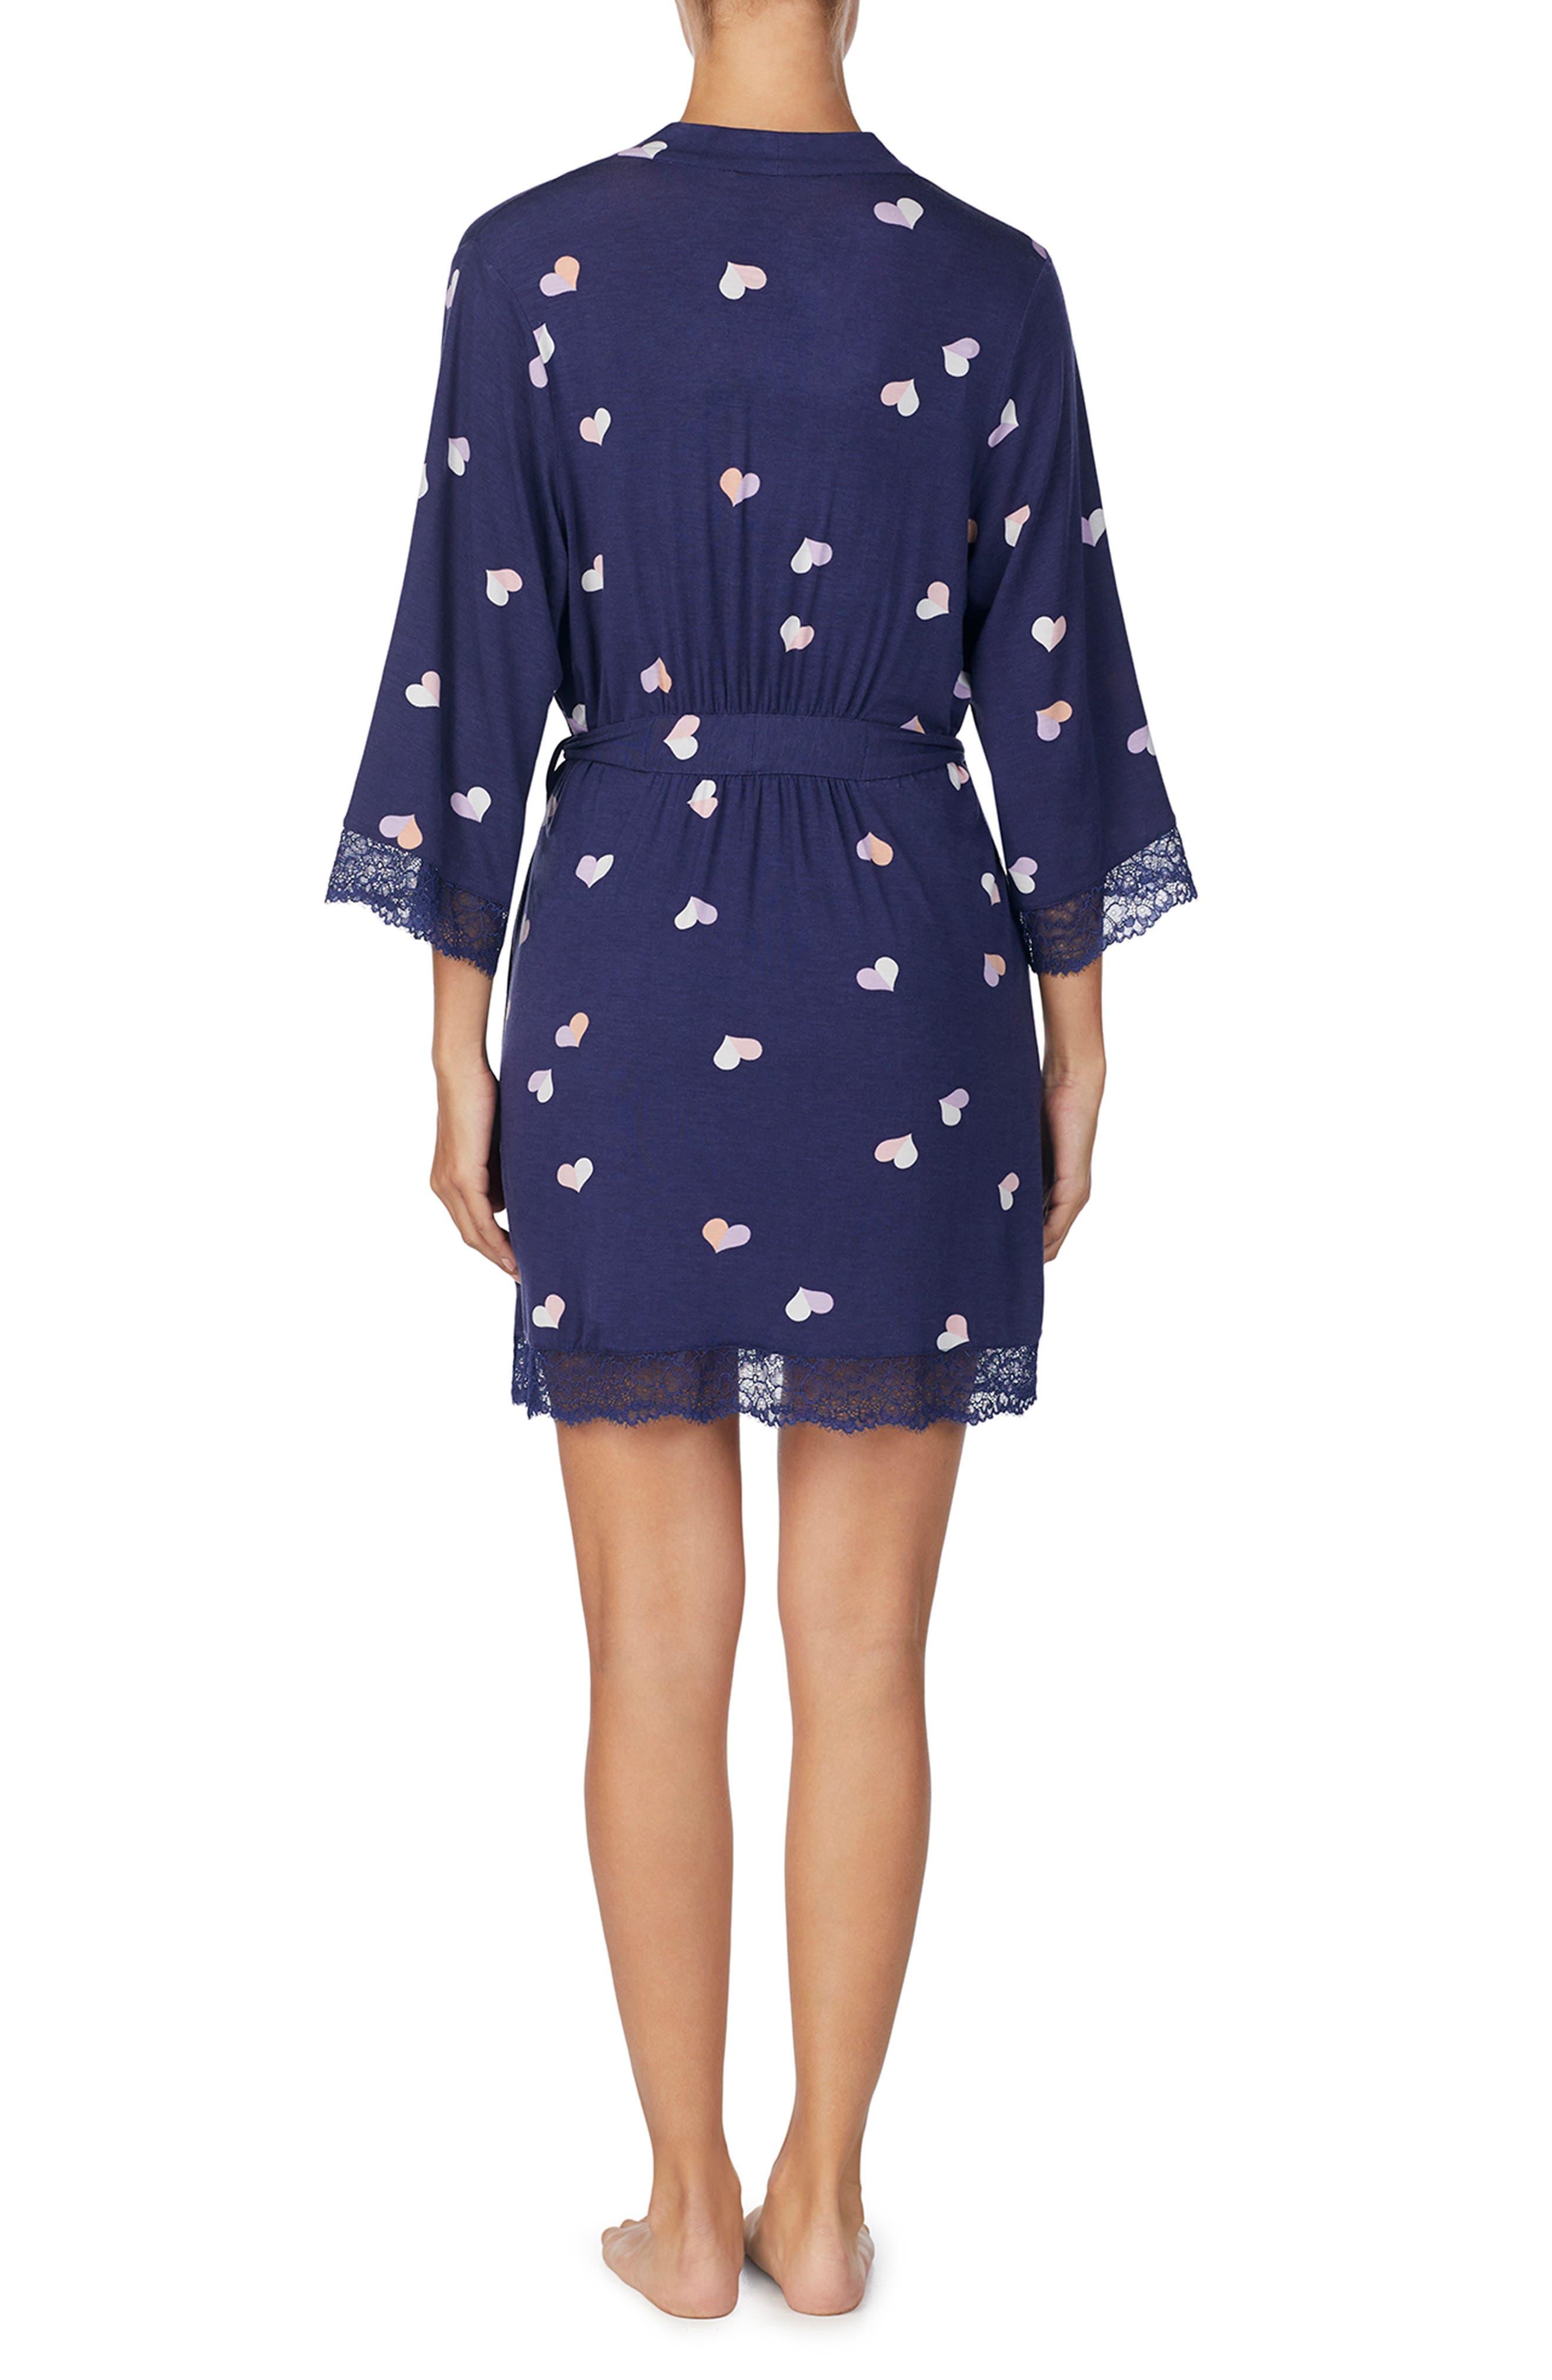 KATE SPADE NEW YORK, lace trim knit robe, Alternate thumbnail 2, color, 489